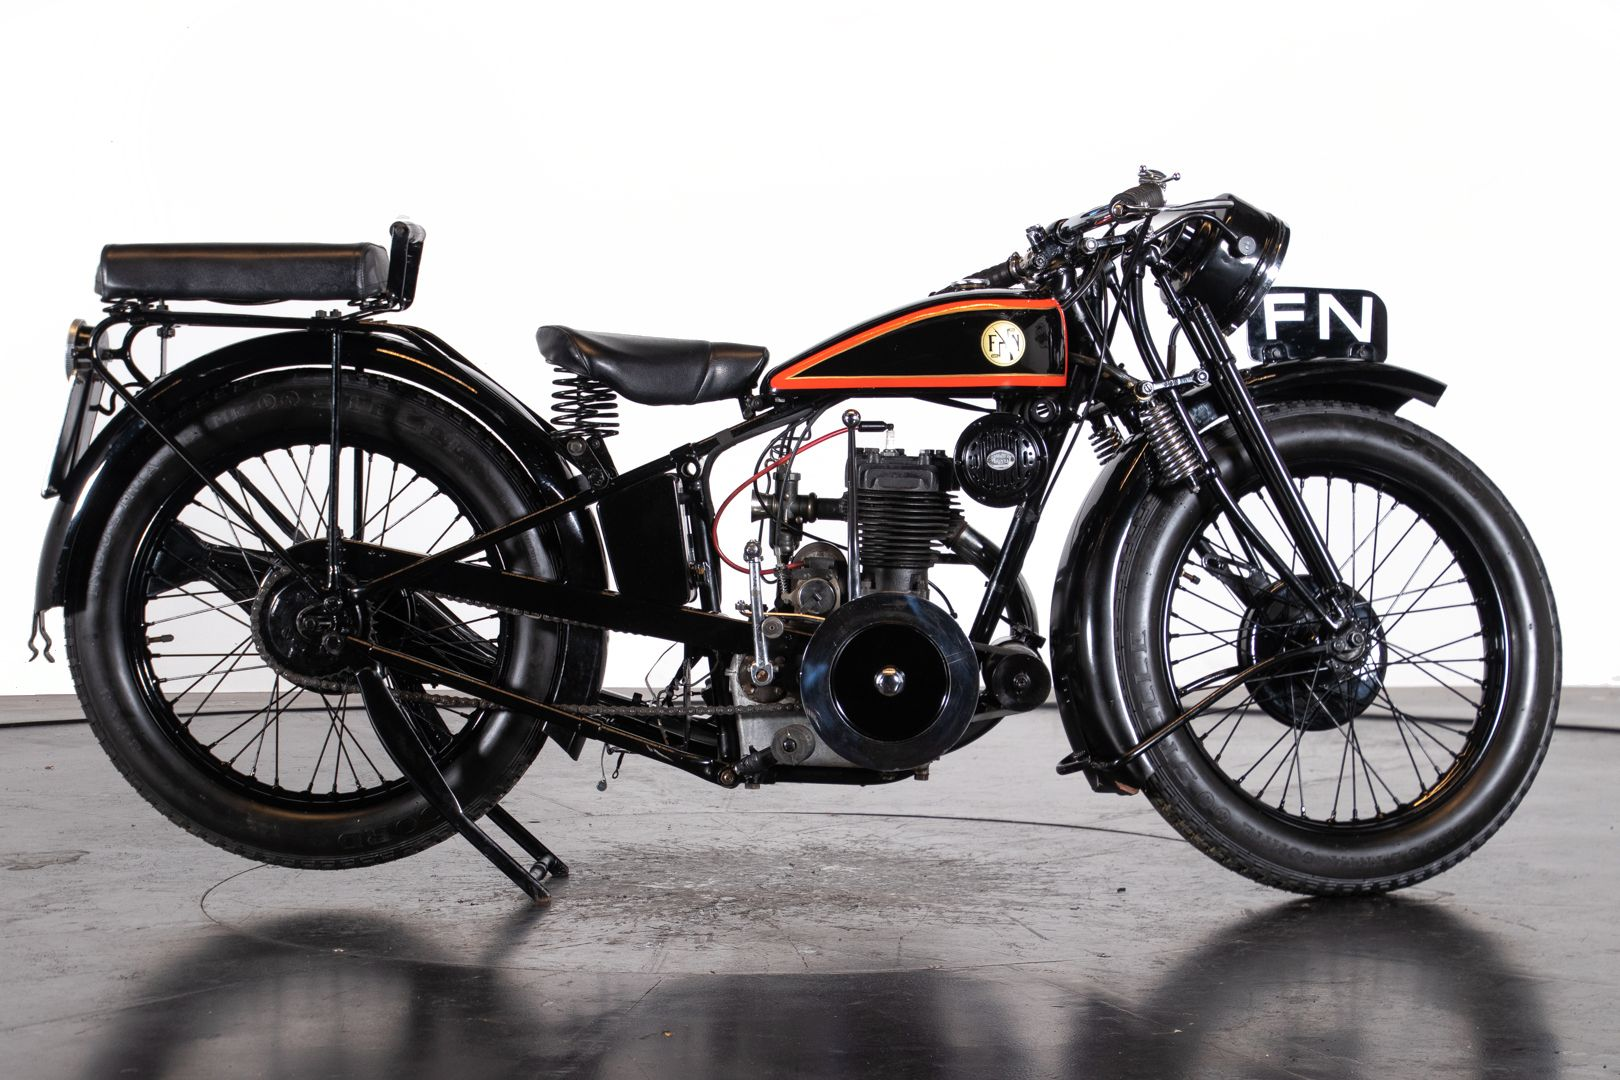 1935 FN 350 55956